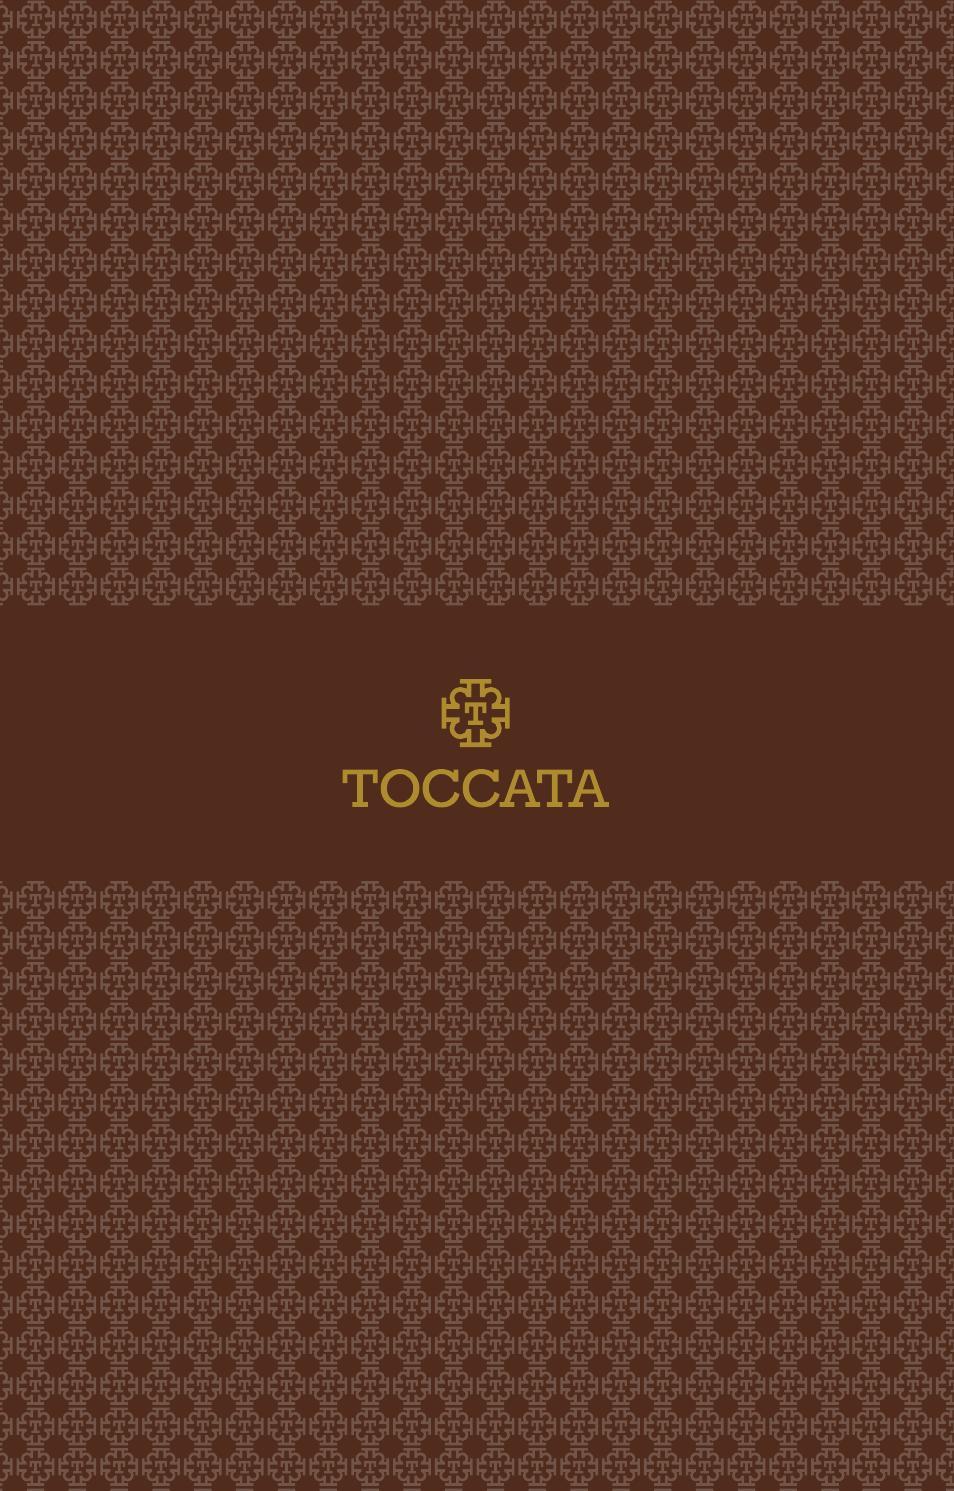 Toccata By Finbar By Finbar Group Limited Issuu